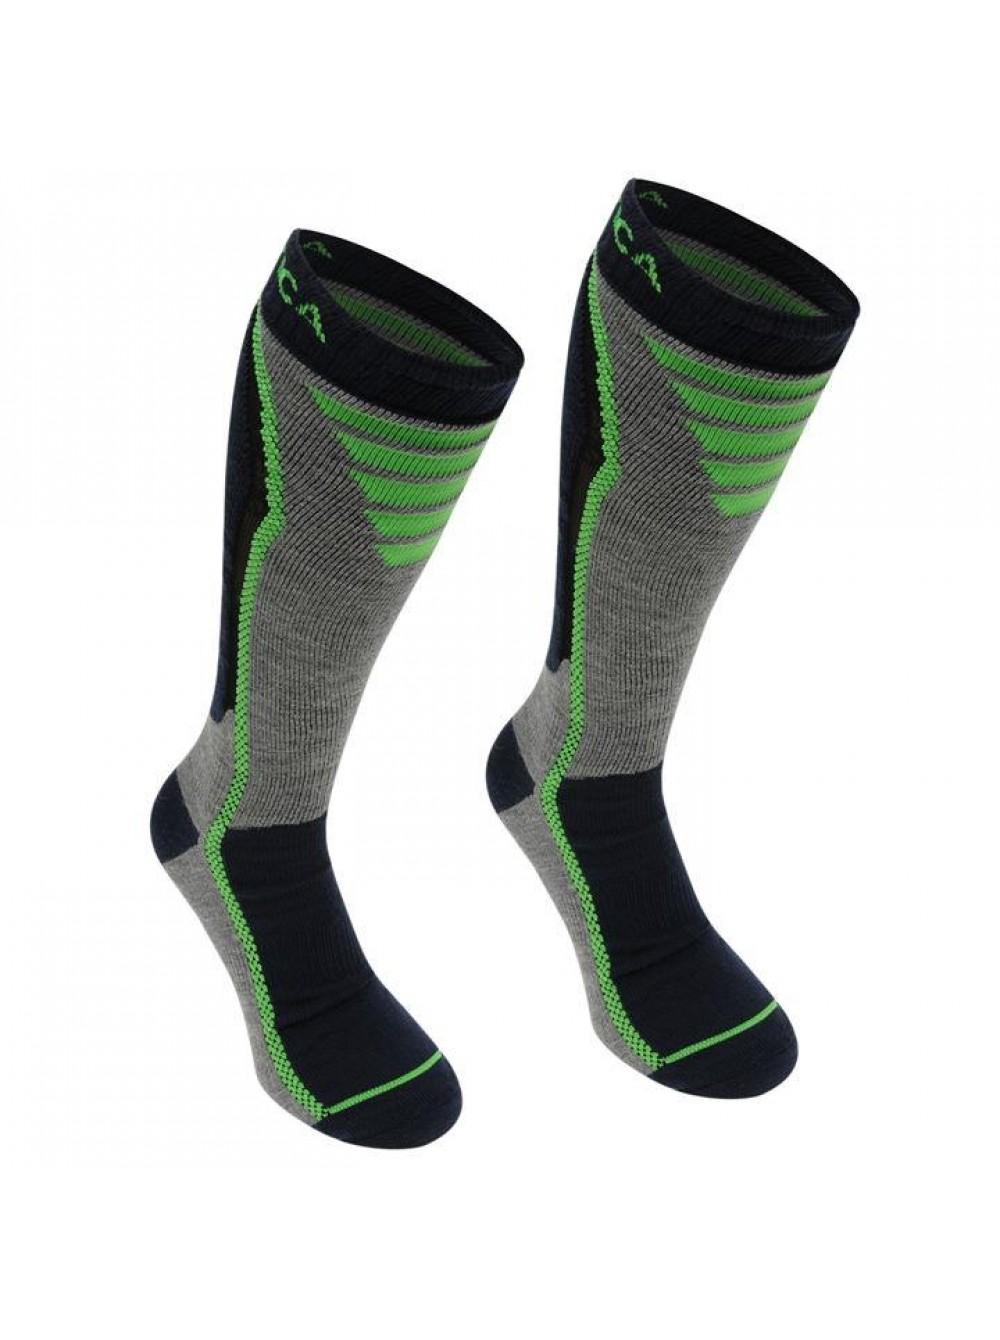 Лижні шкарпетки Nevica Pro Ski Socks 2 пари 0146357465a74